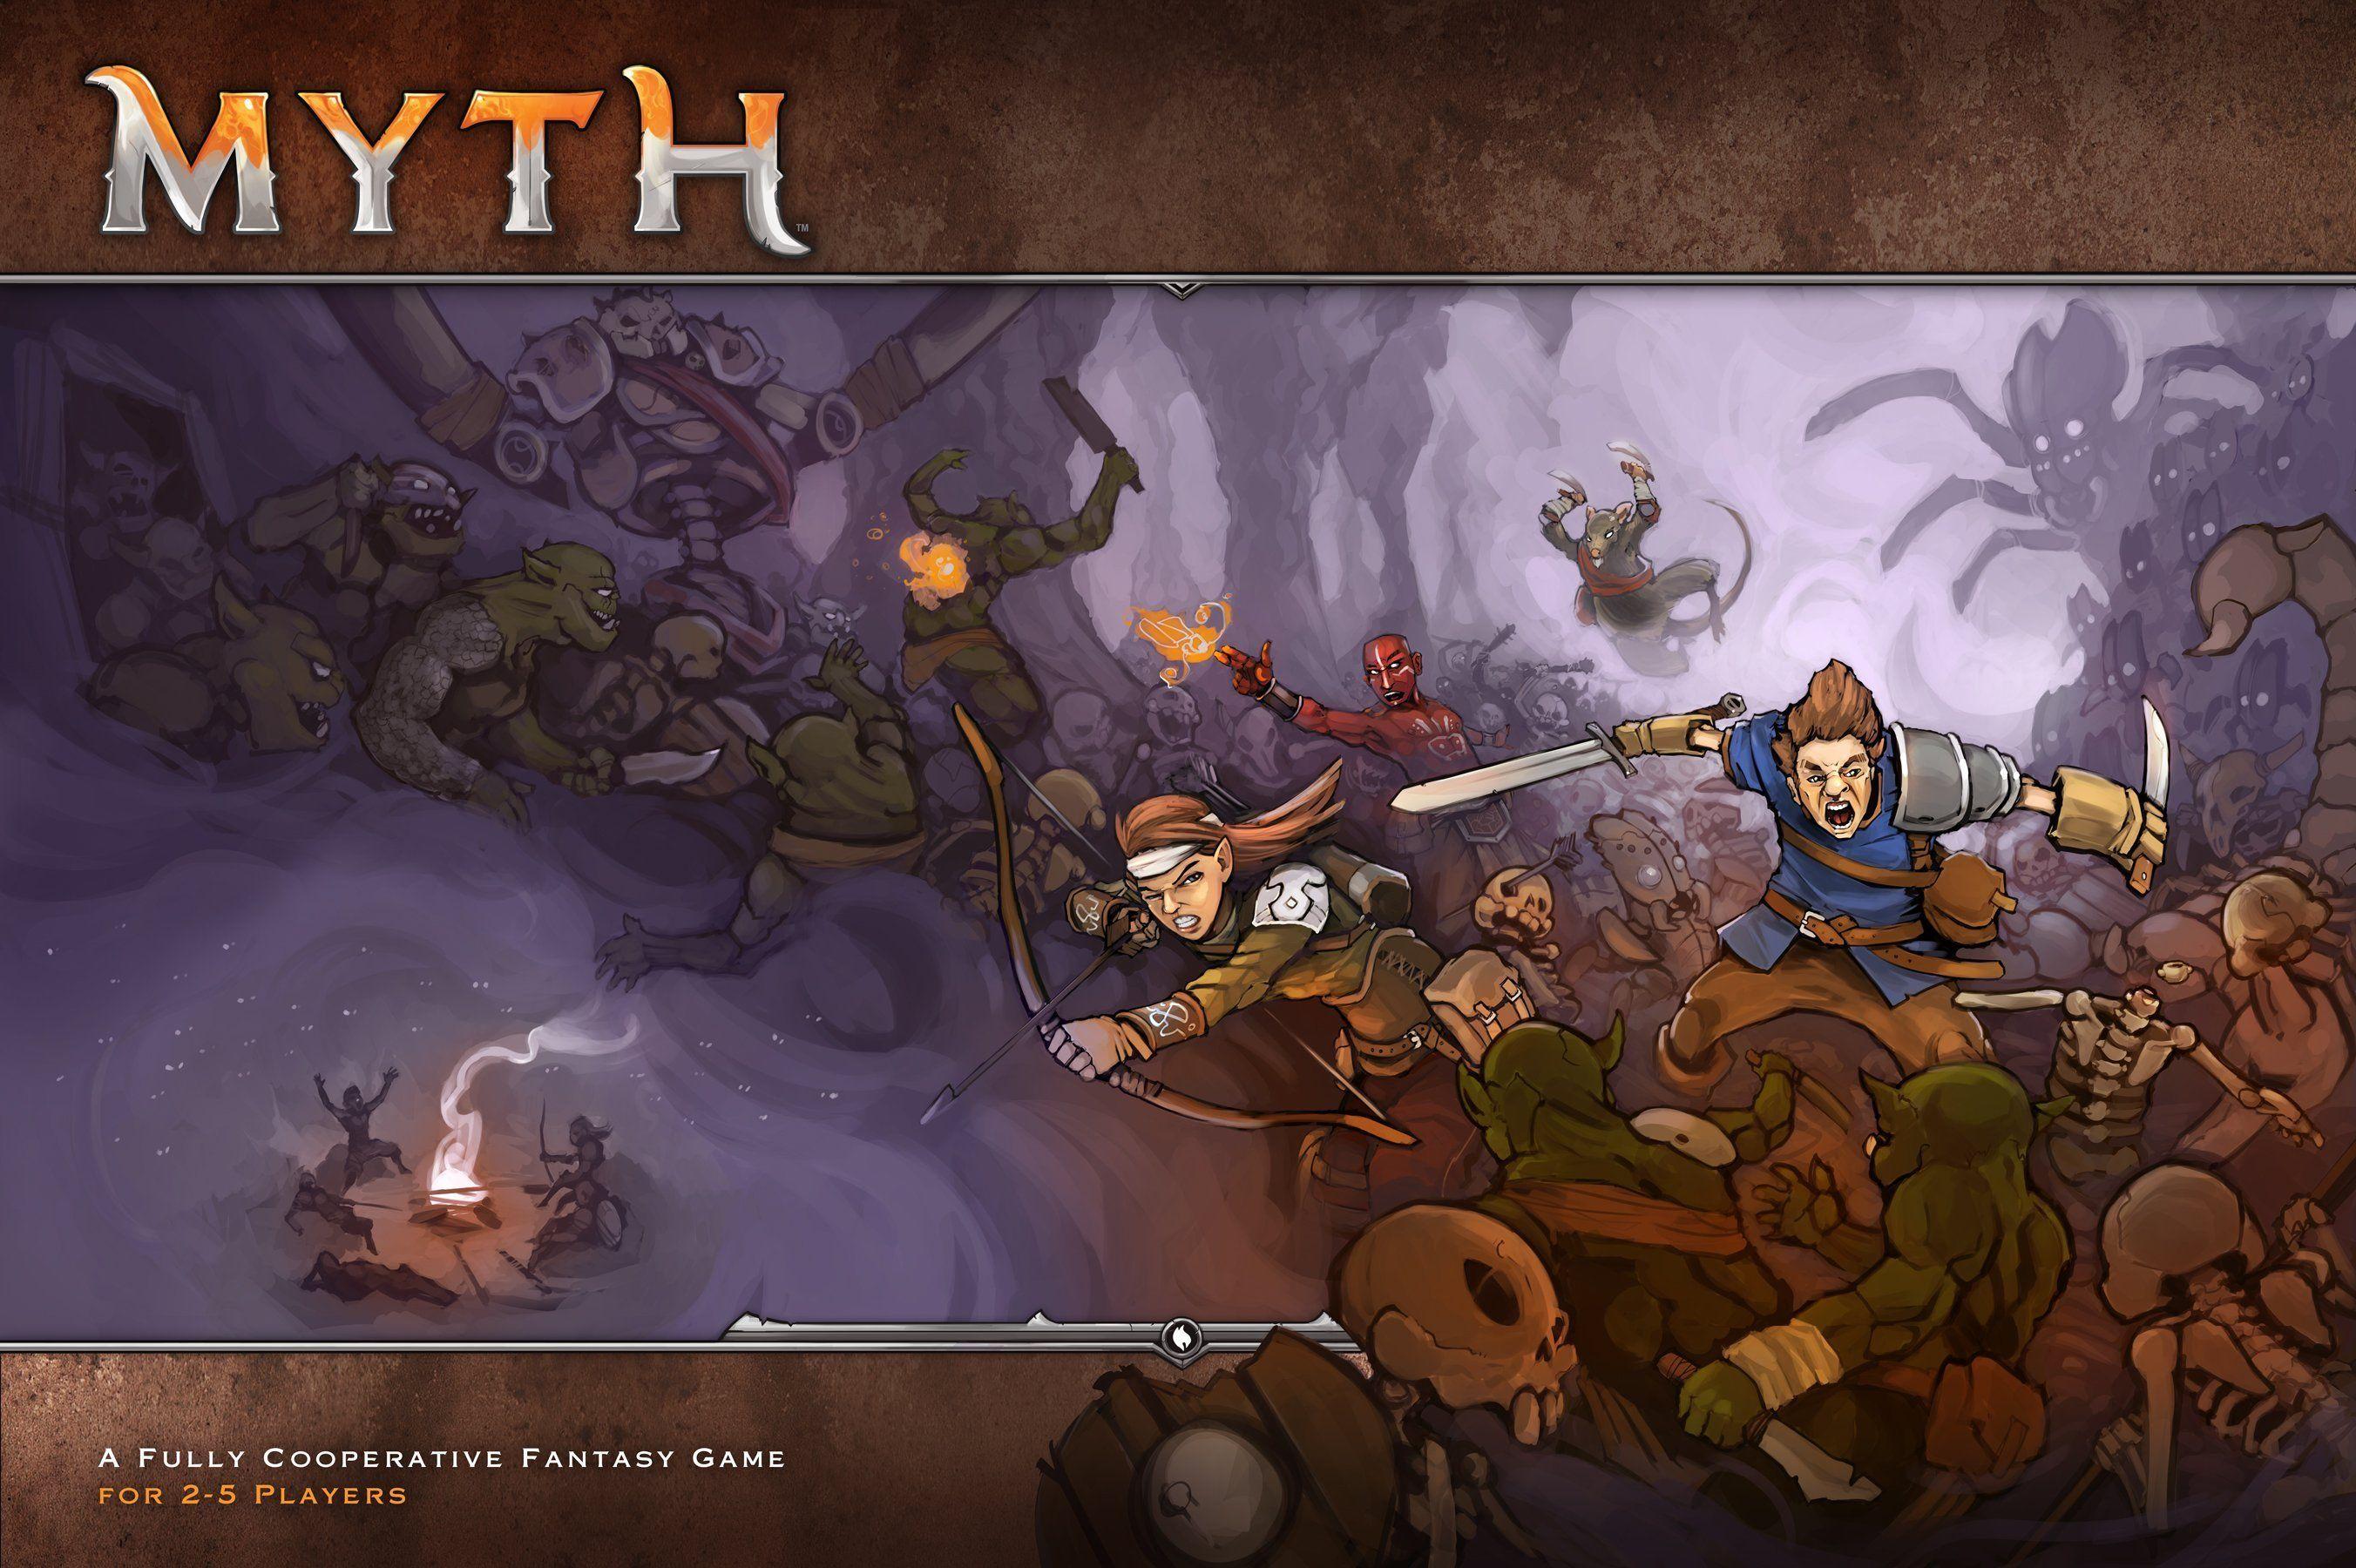 MYTH Dredge Minion Pack (Kickstarter Special) The Game